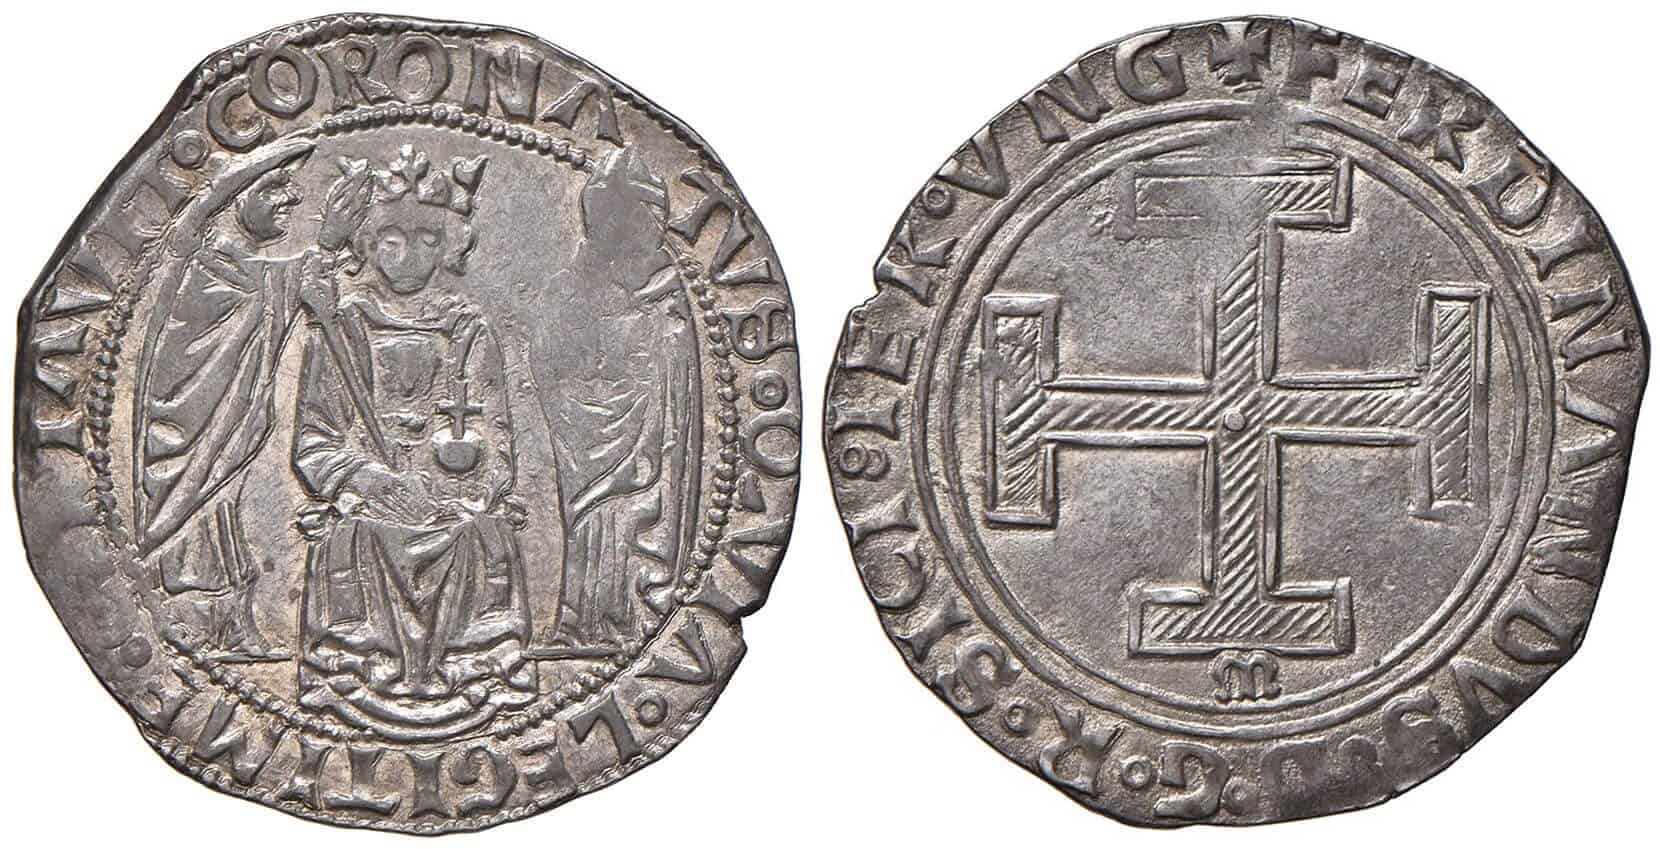 Coronado de Fernando I de Nápoles